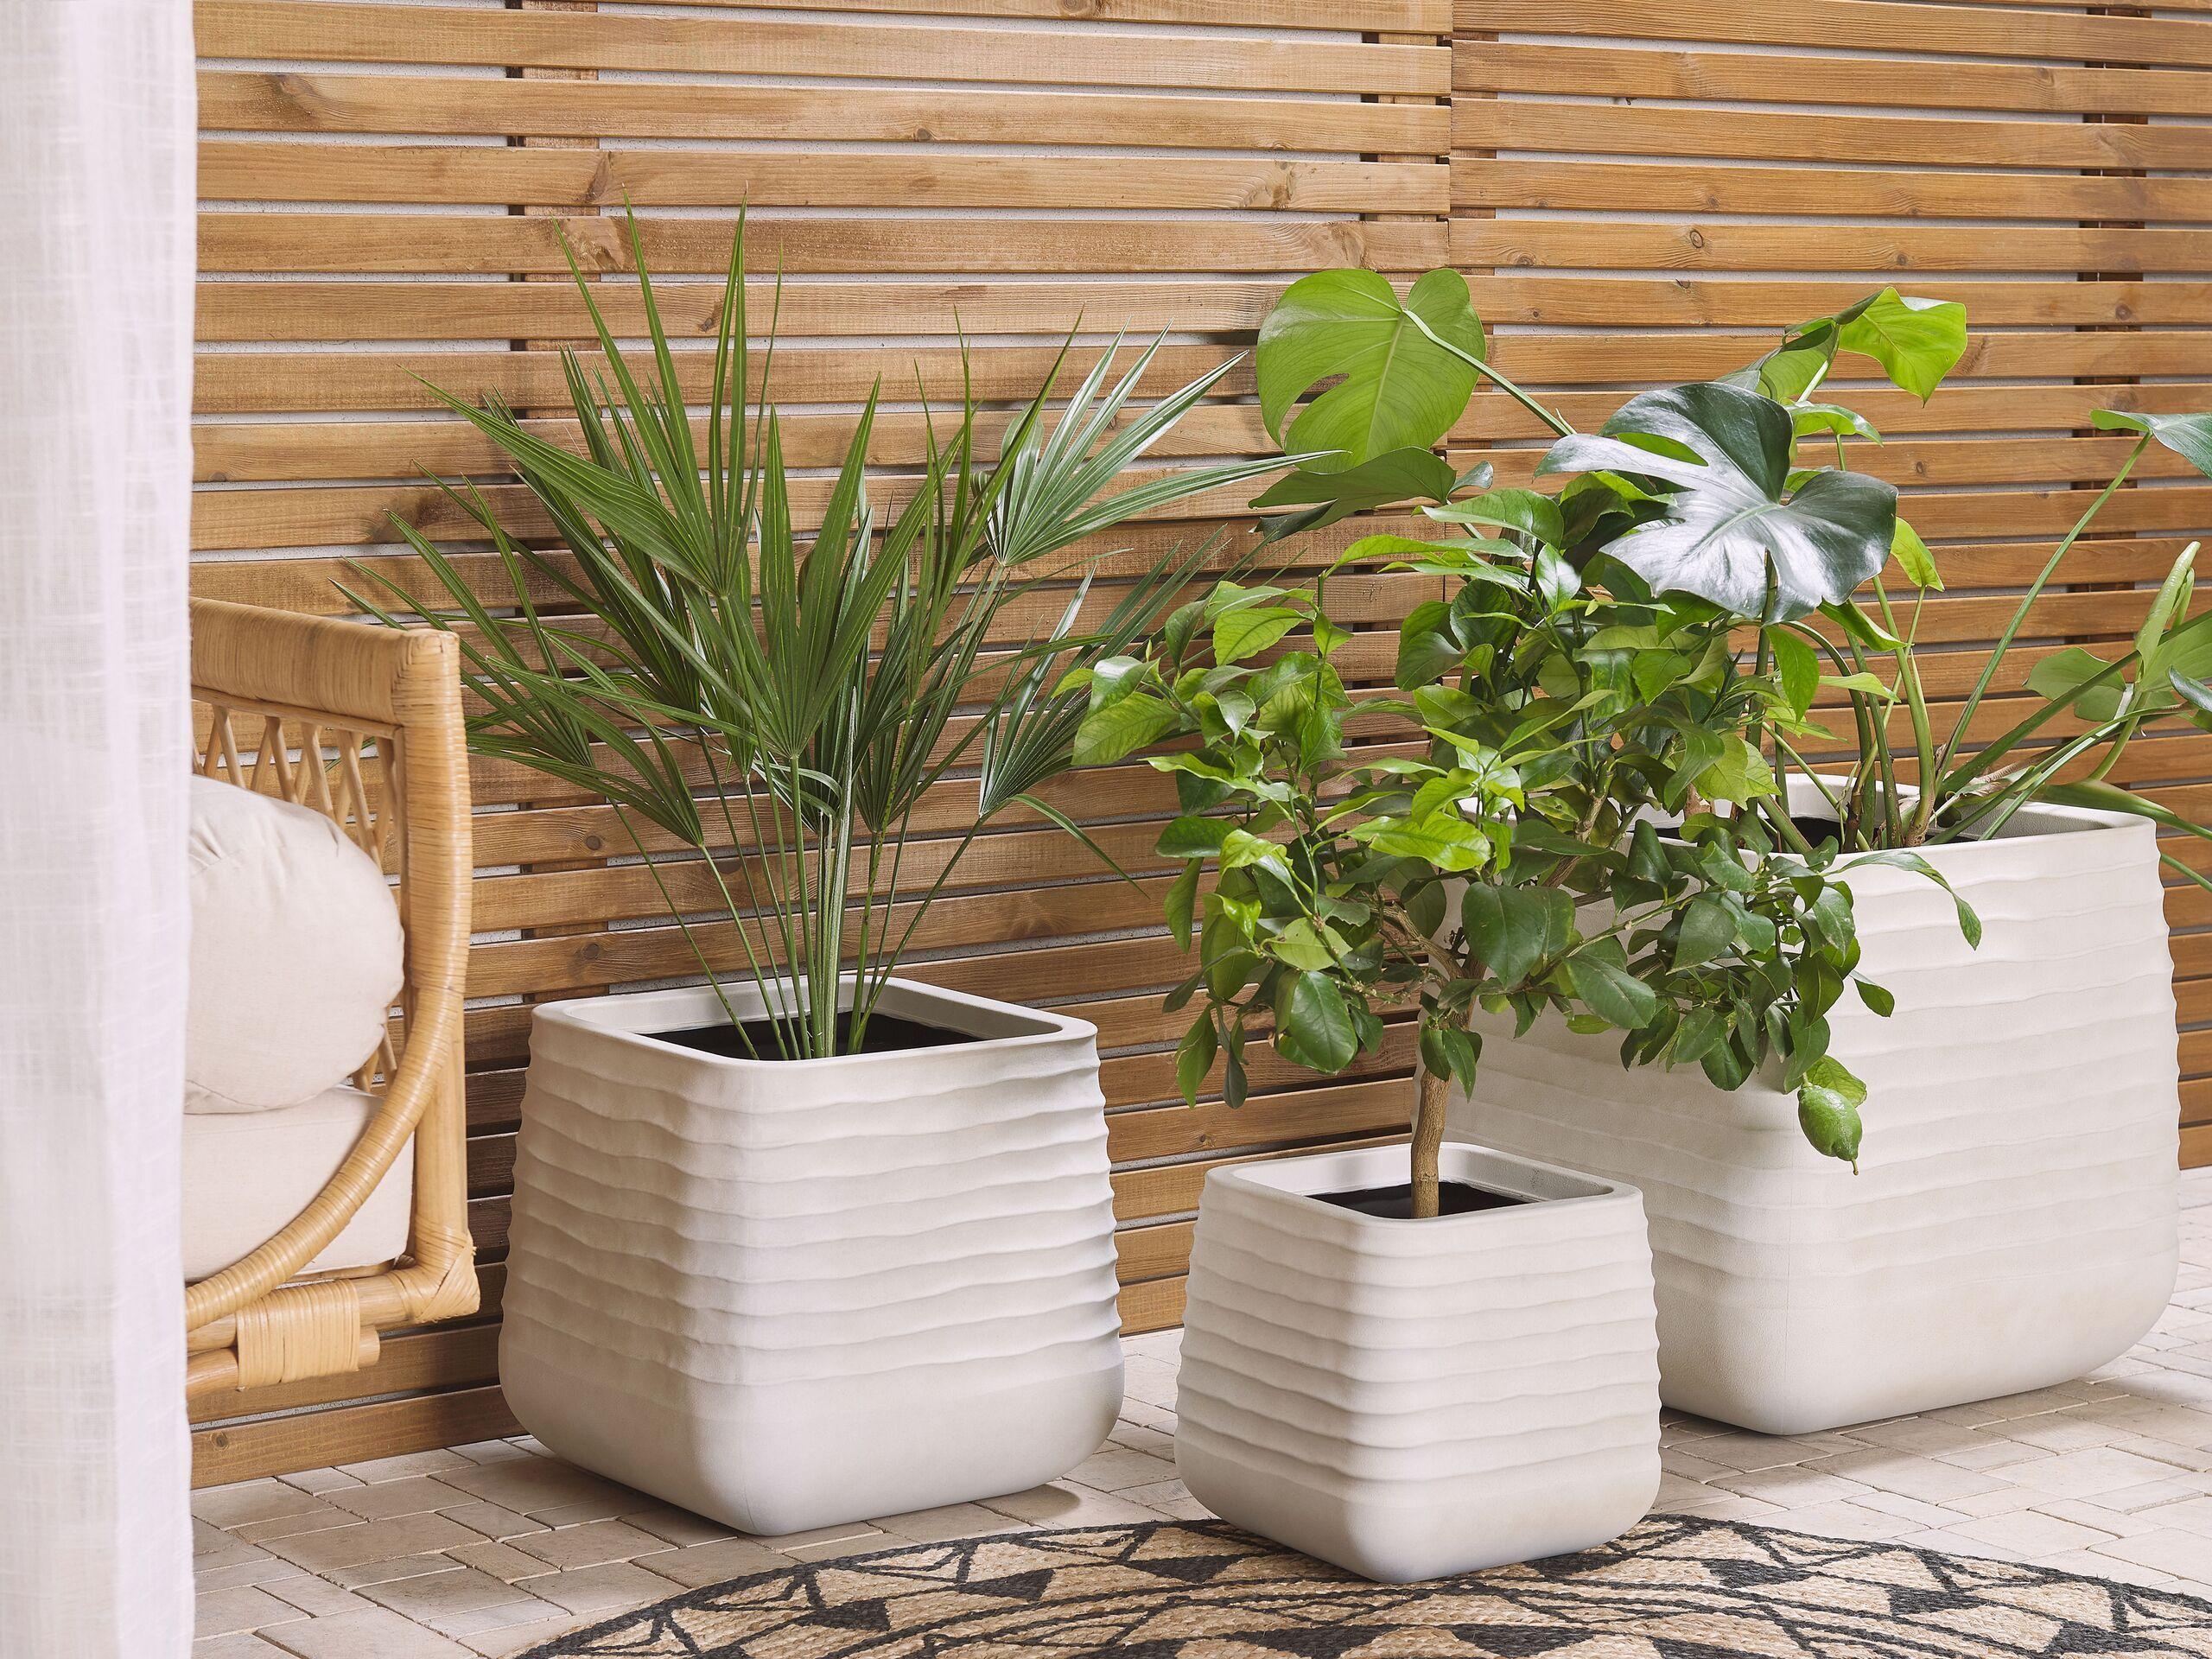 beliani moderno set di 3 vasi per fiori quadrati in varie dimensioni bianco sporco